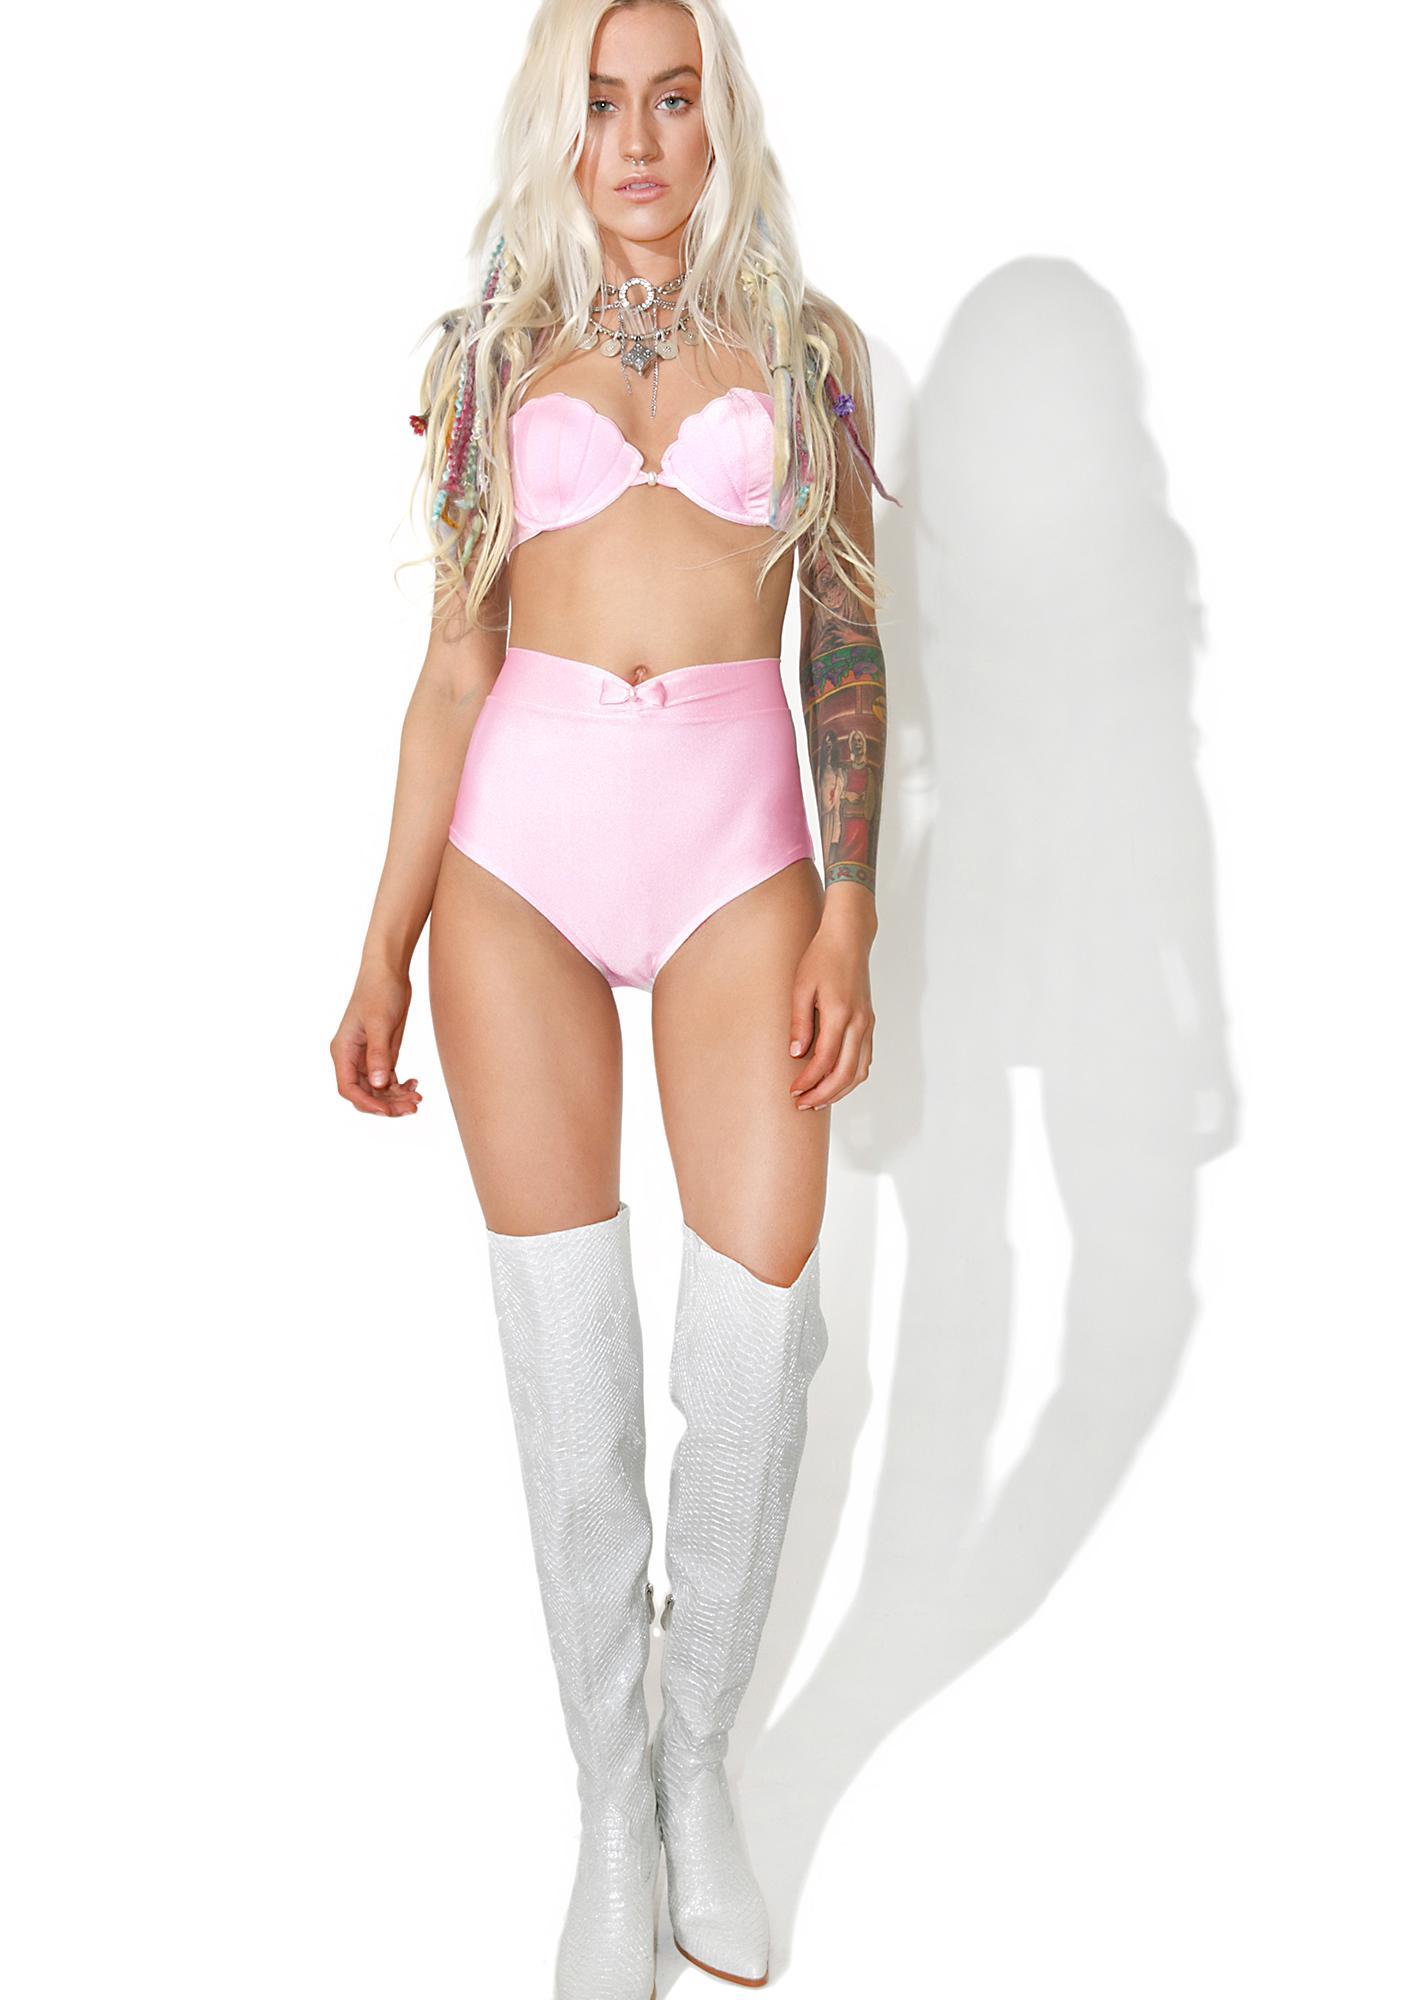 Margarita Mermaid Lolita Bikini Top